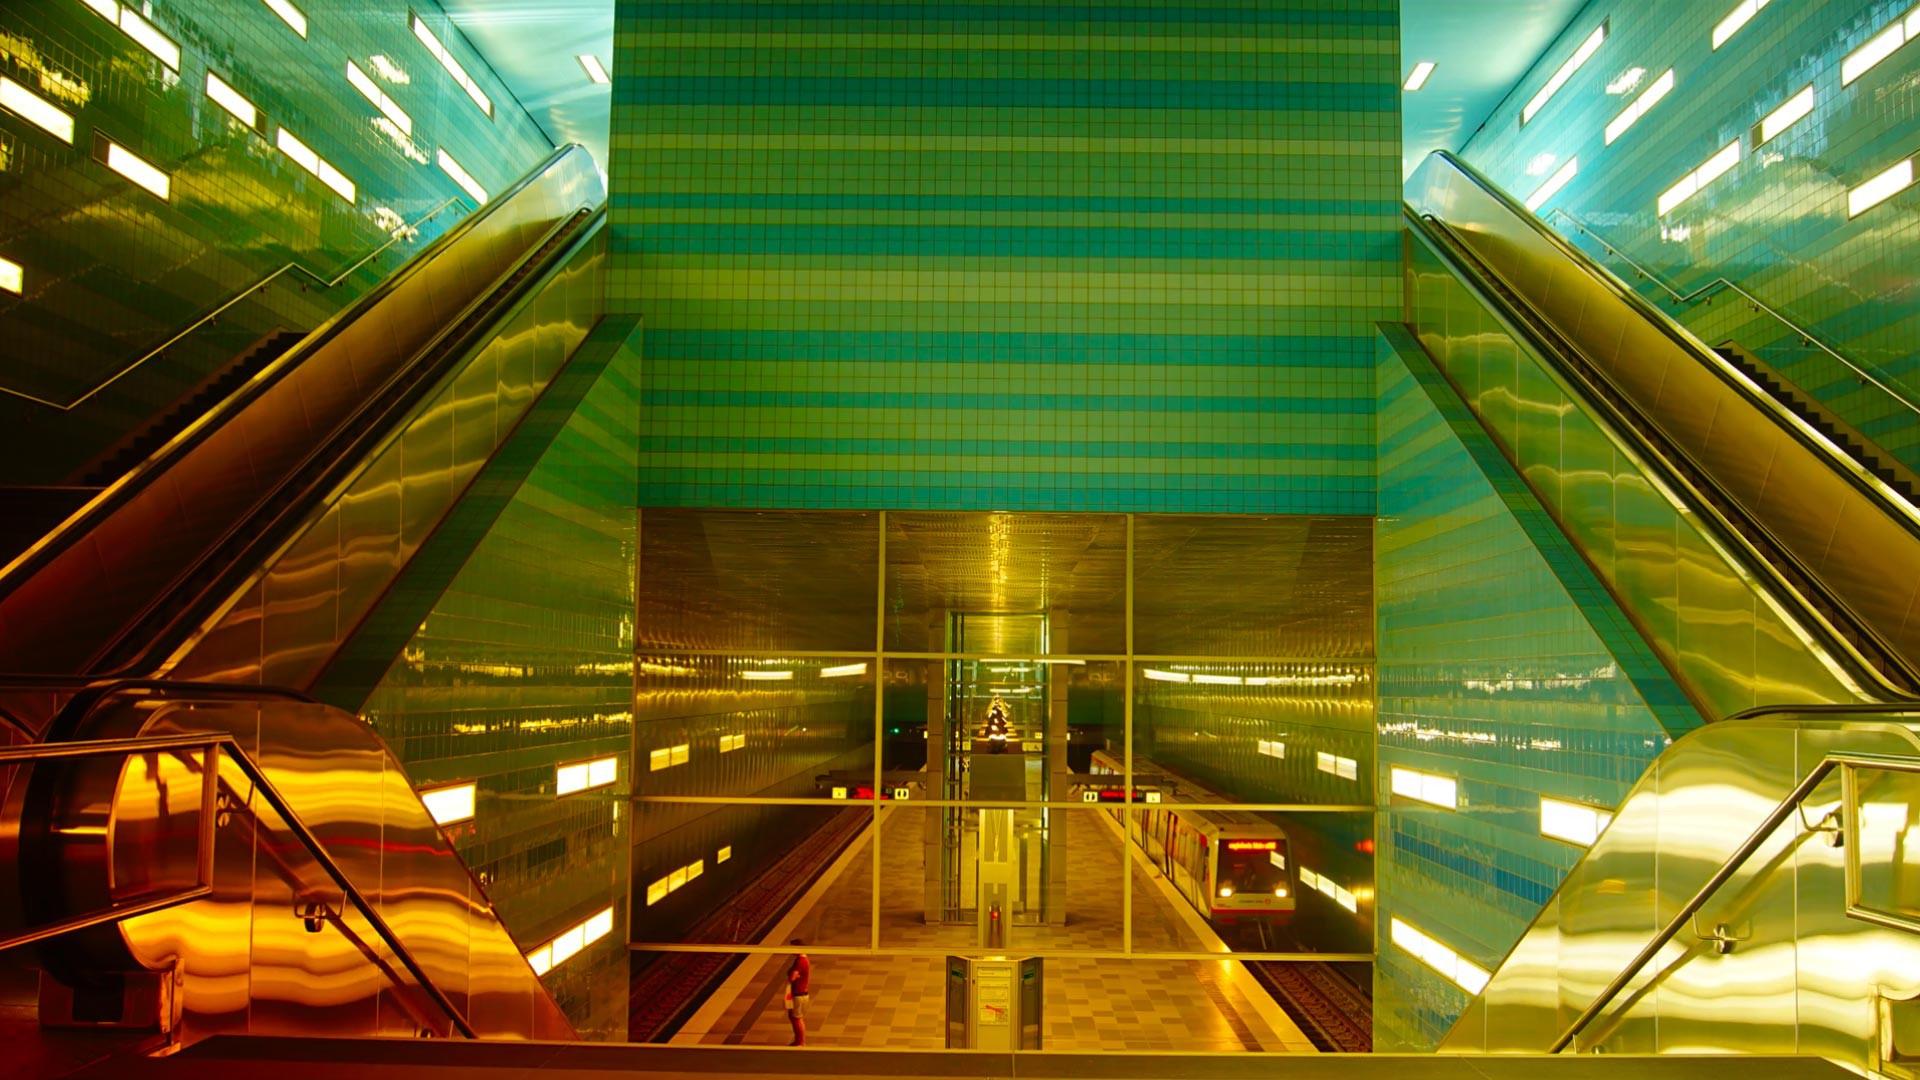 General 1920x1080 glass architecture ladders escalator metro railway station lights underground Hamburg Germany